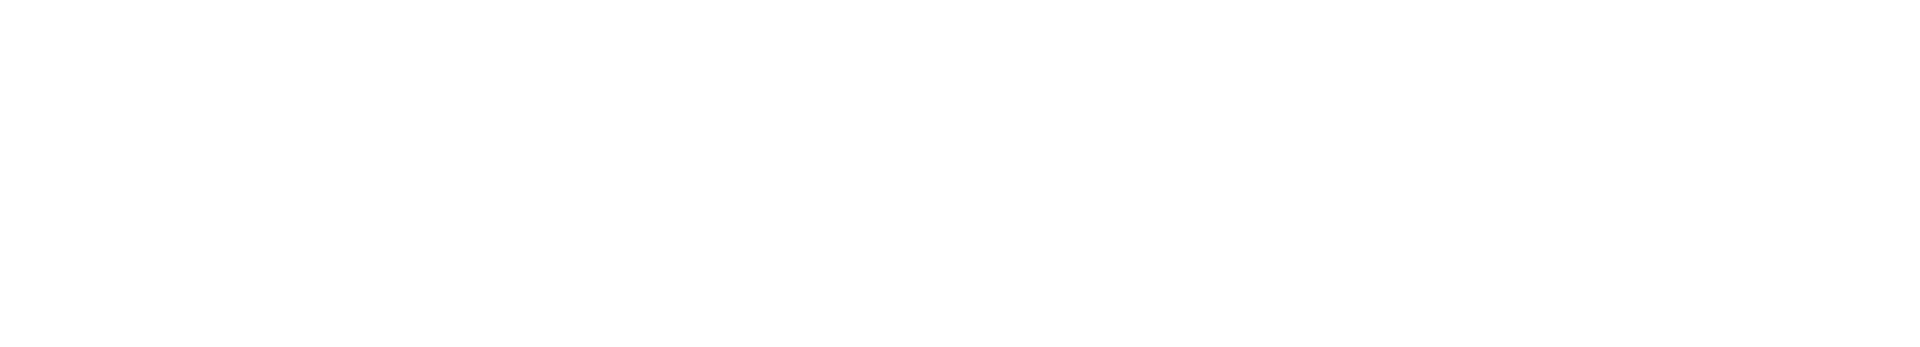 Circle Top Left